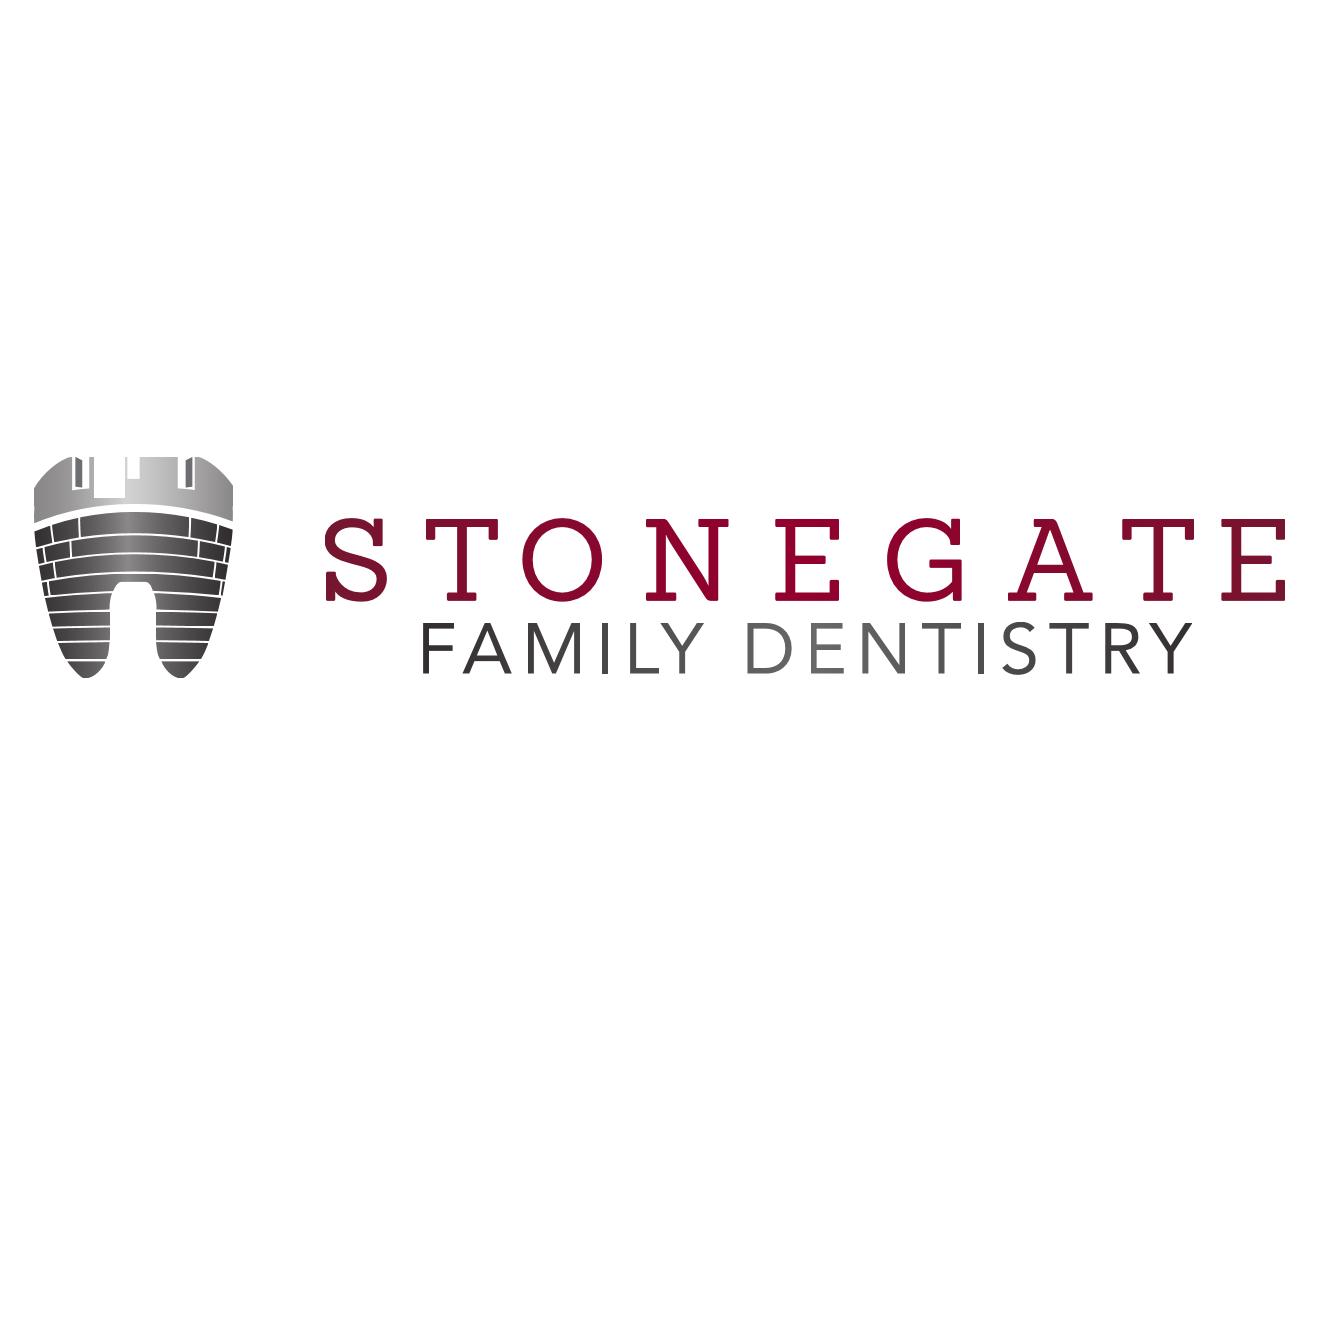 Stonegate Family Dentistry - Murfreesboro, TN - Dentists & Dental Services